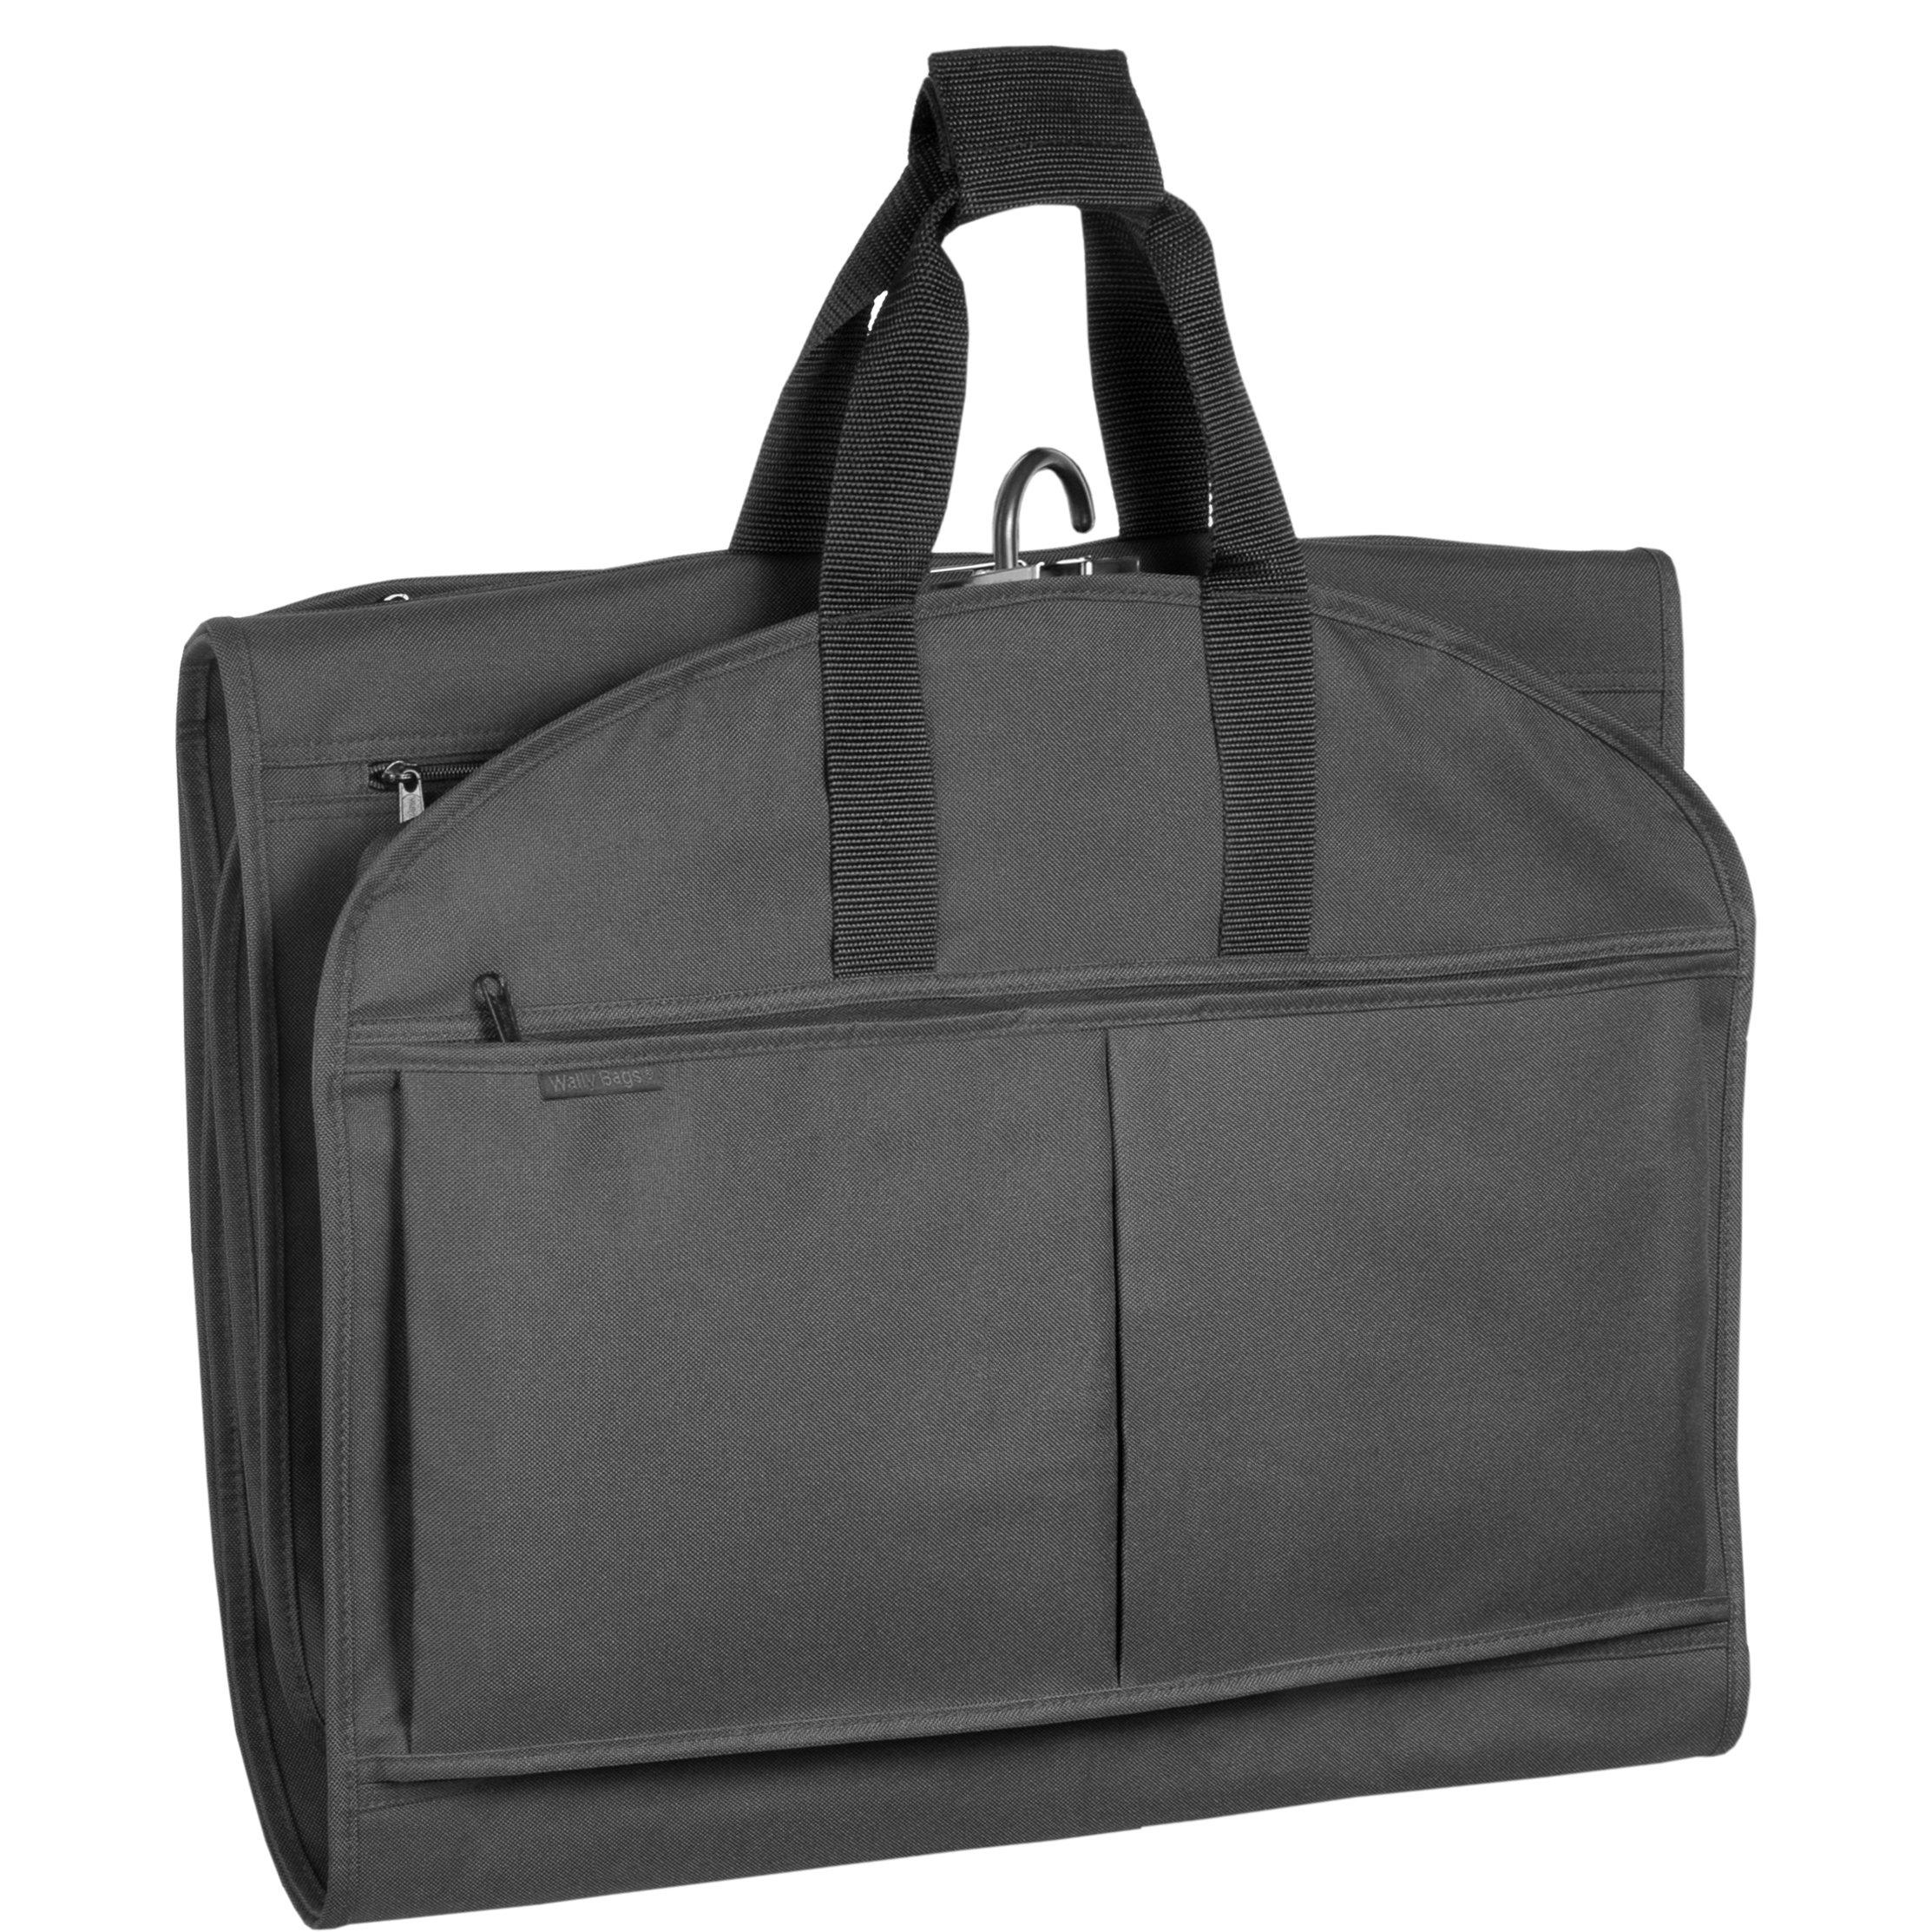 WallyBags 52-inch GarmenTote Tri-Fold Garment Bag with Pockets